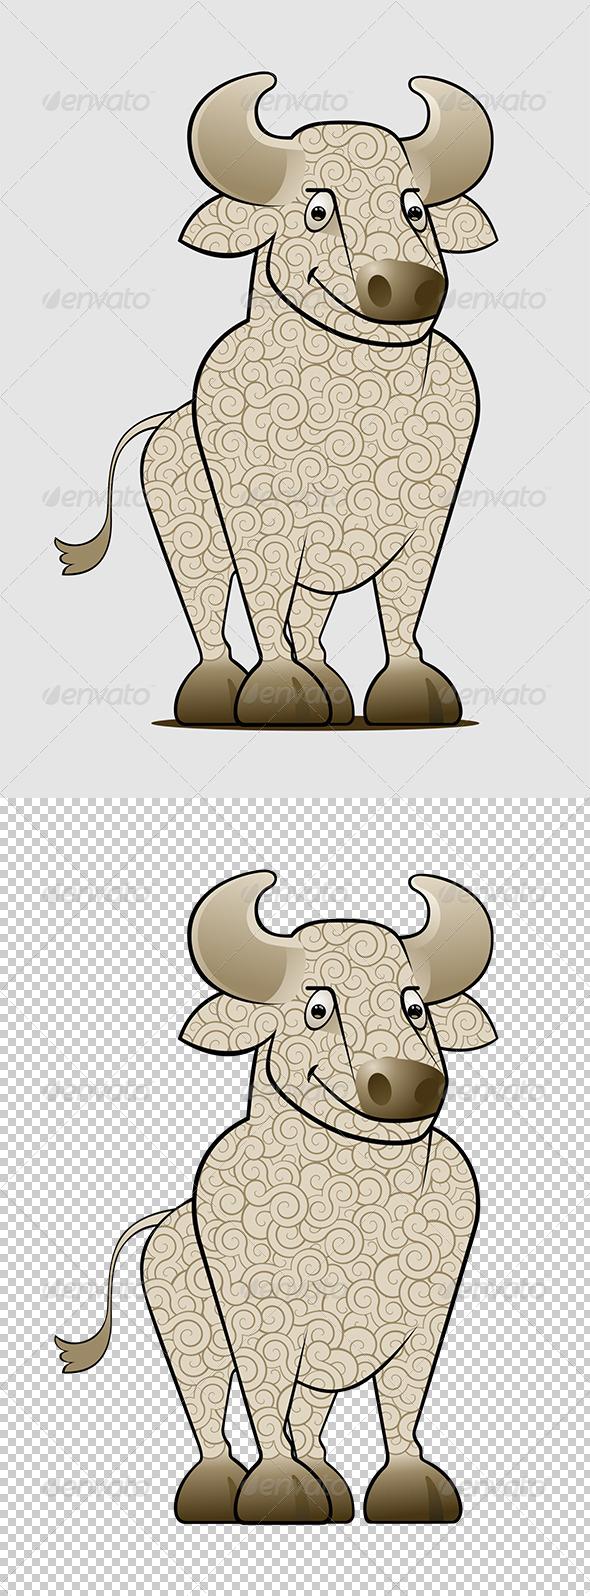 GraphicRiver Cartoon Bull 8001734